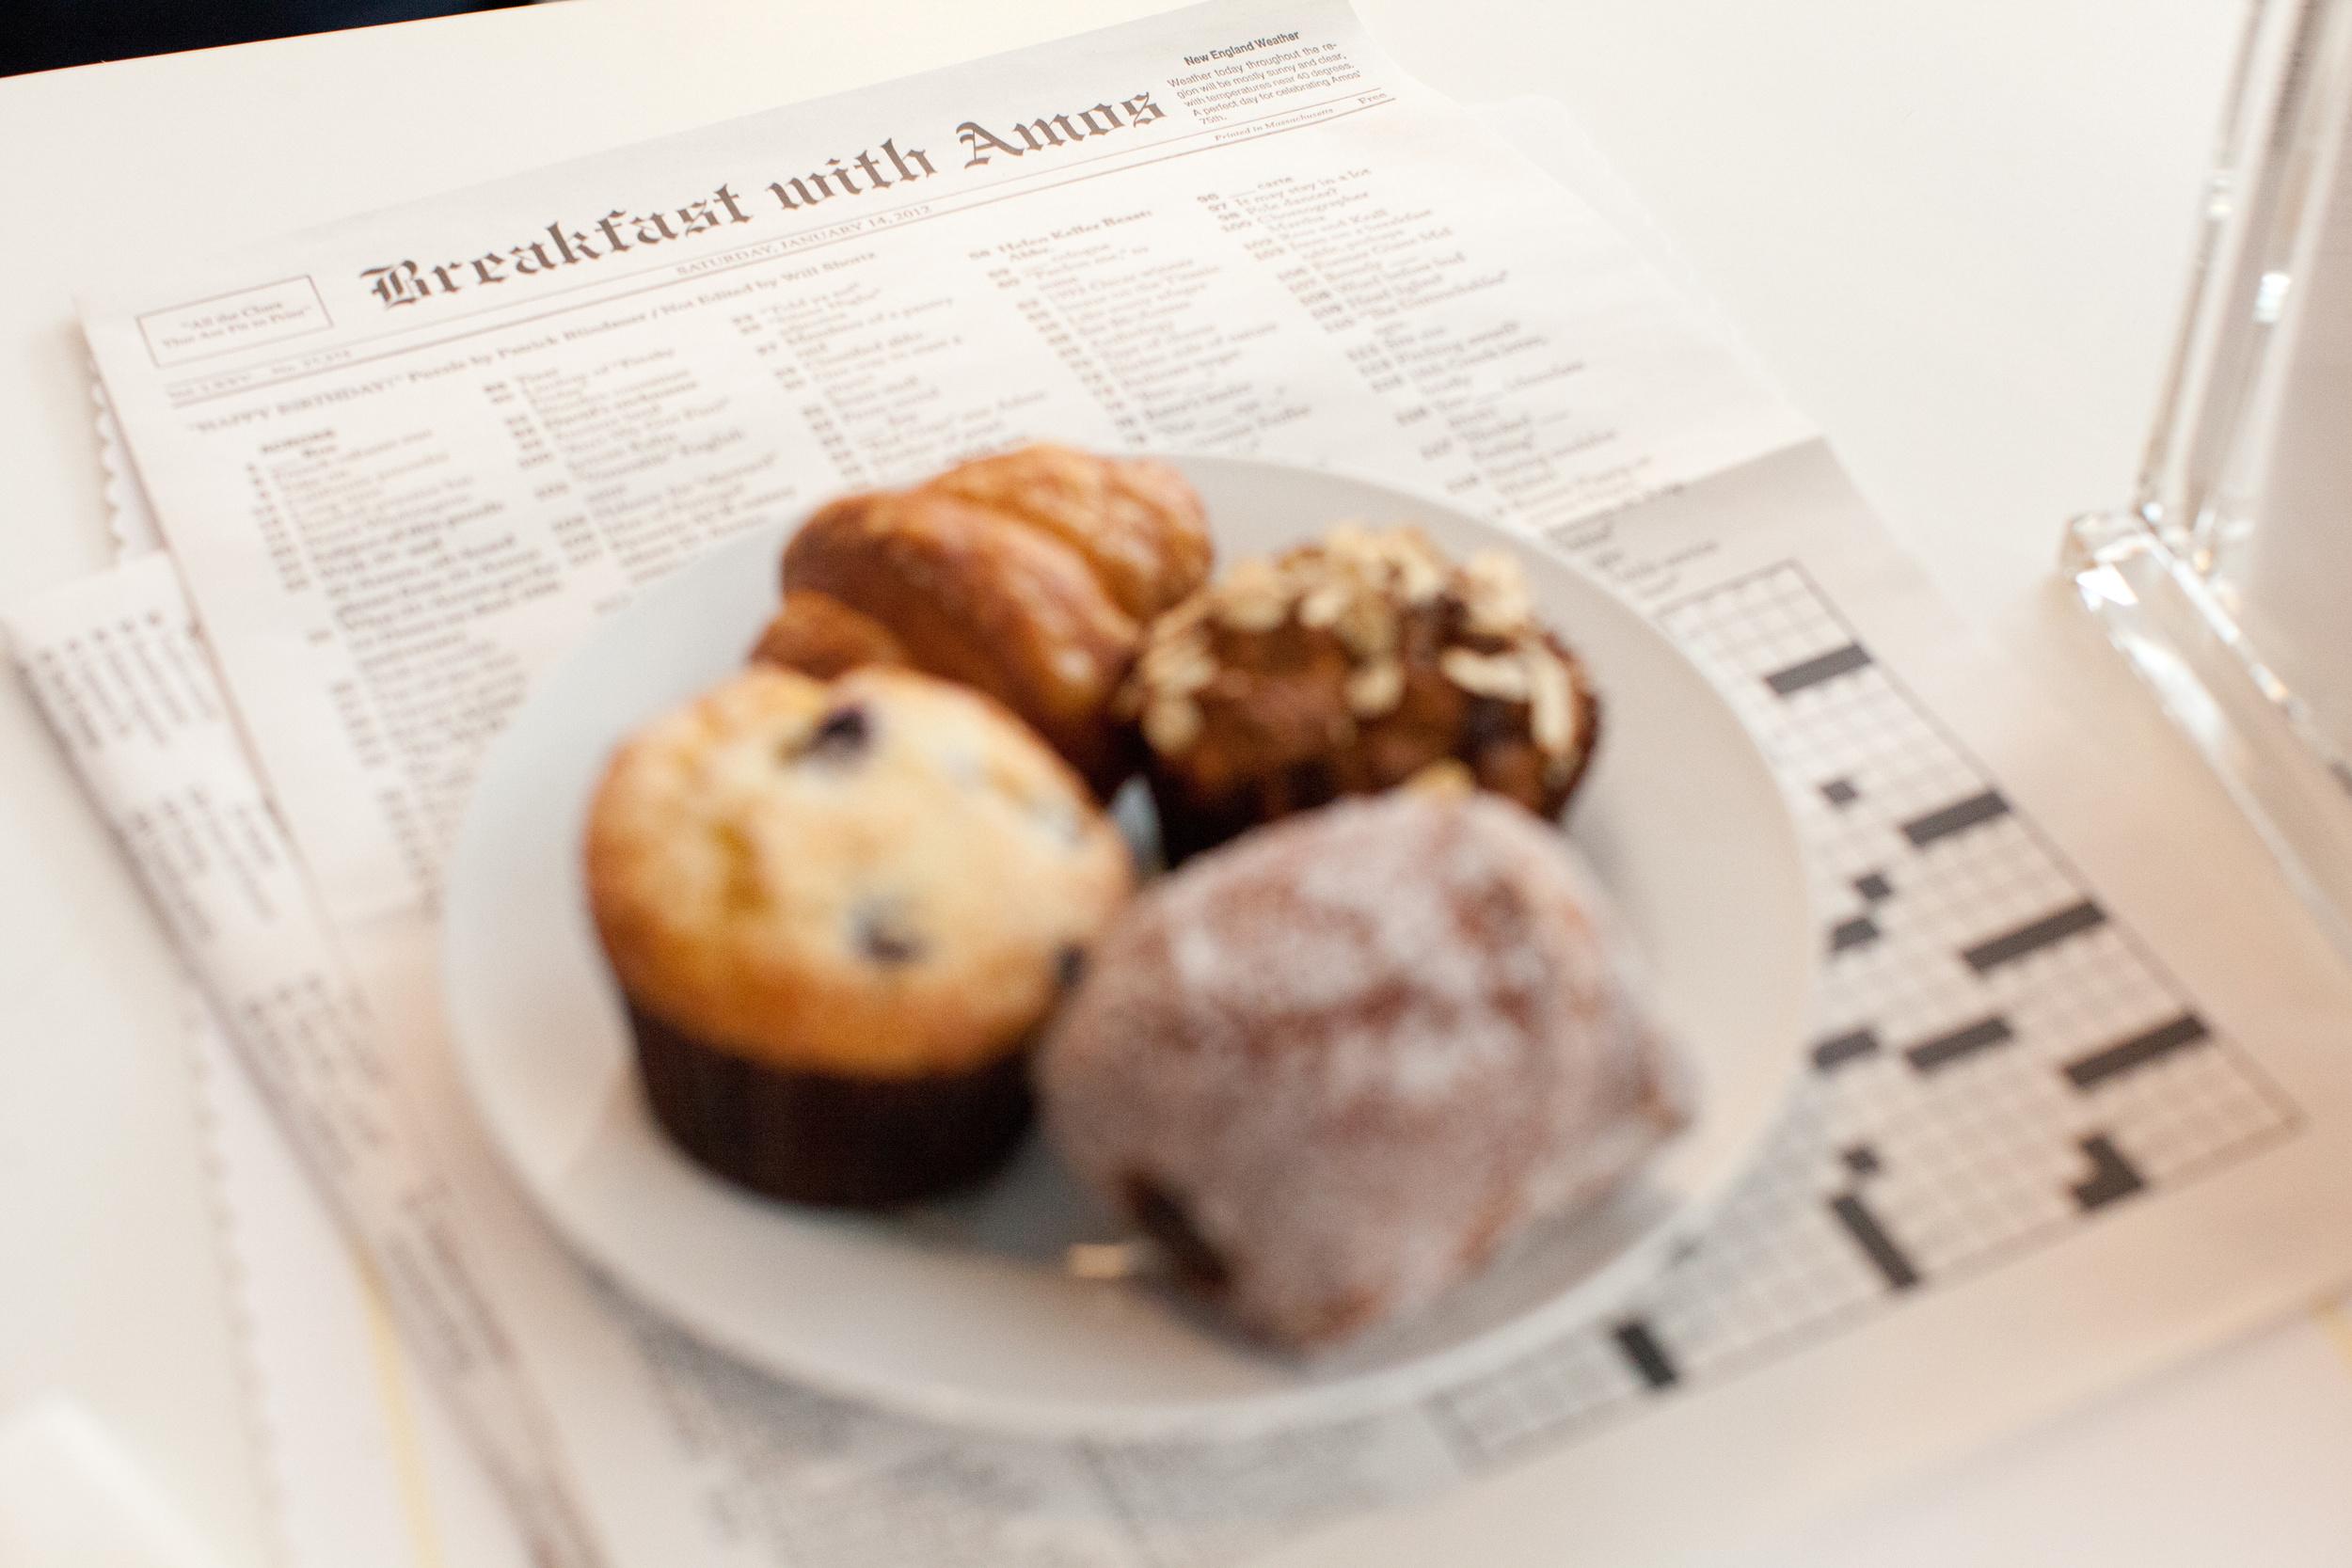 Fwd: 75th Birthday -  crossword & muffins